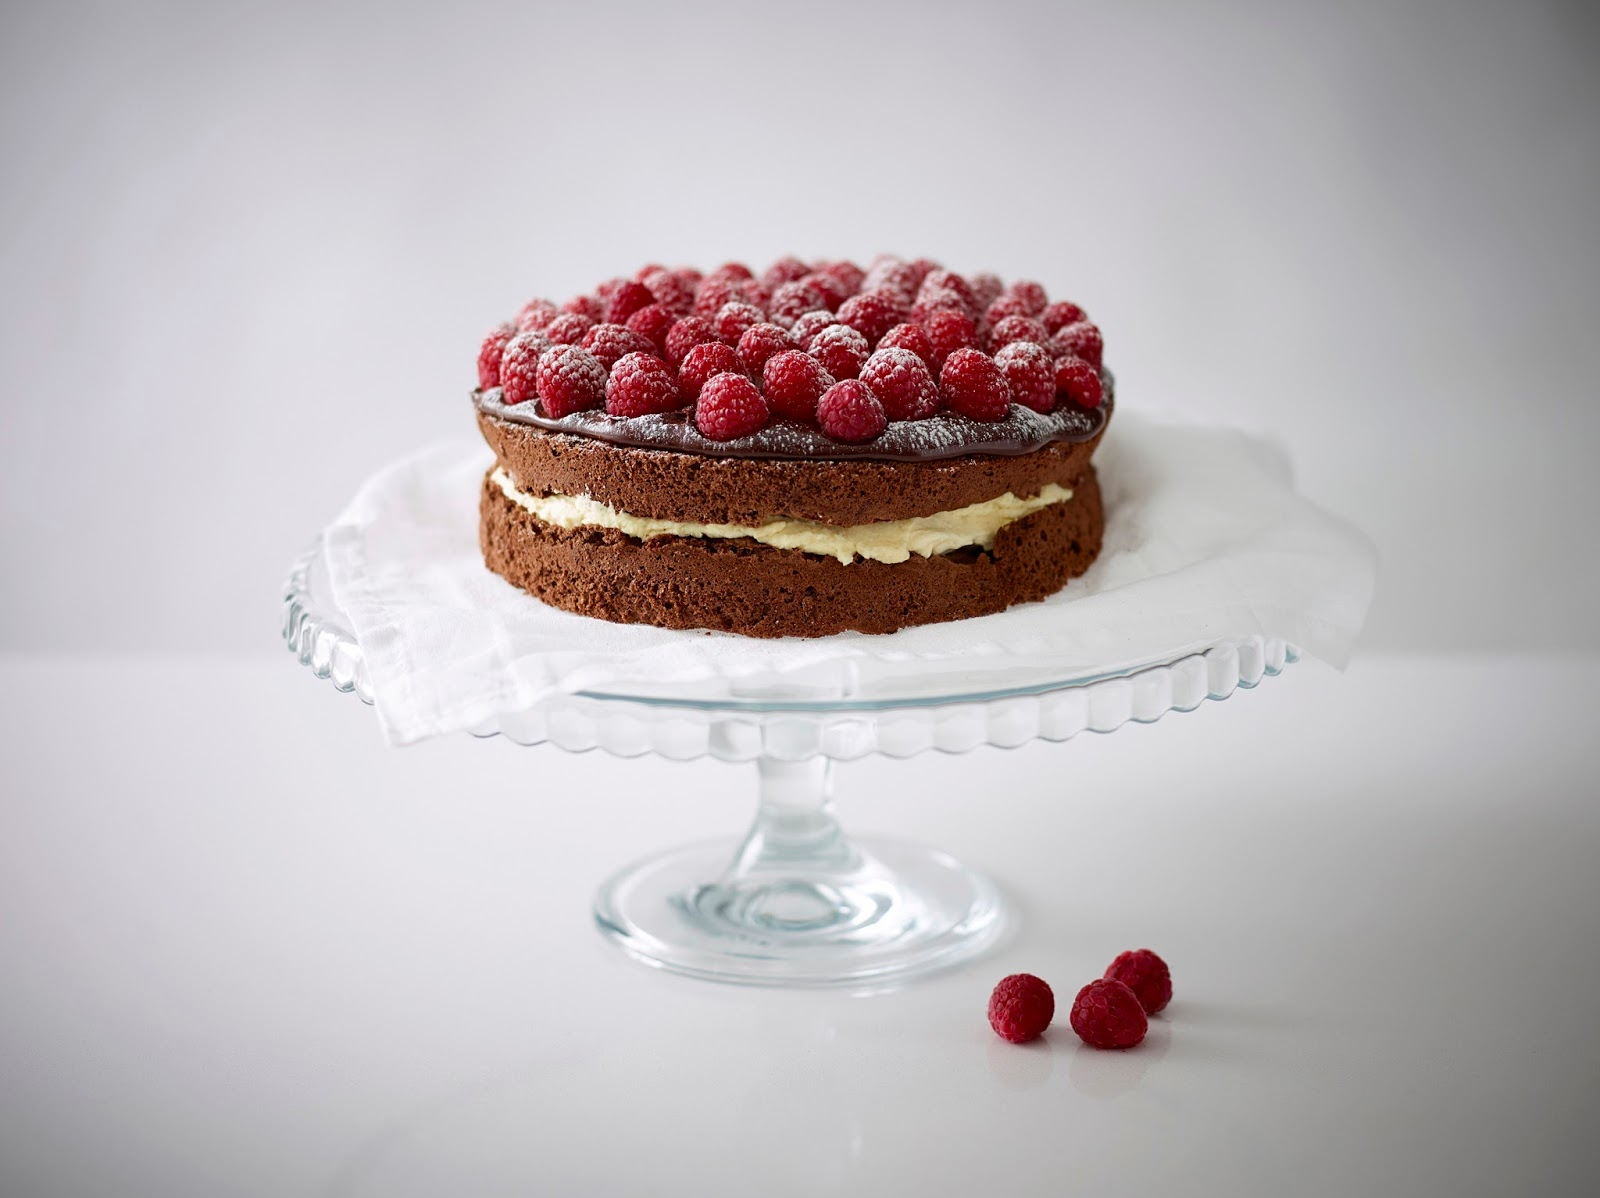 Doves Farm Gluten Free Chocolate Cake Recipe